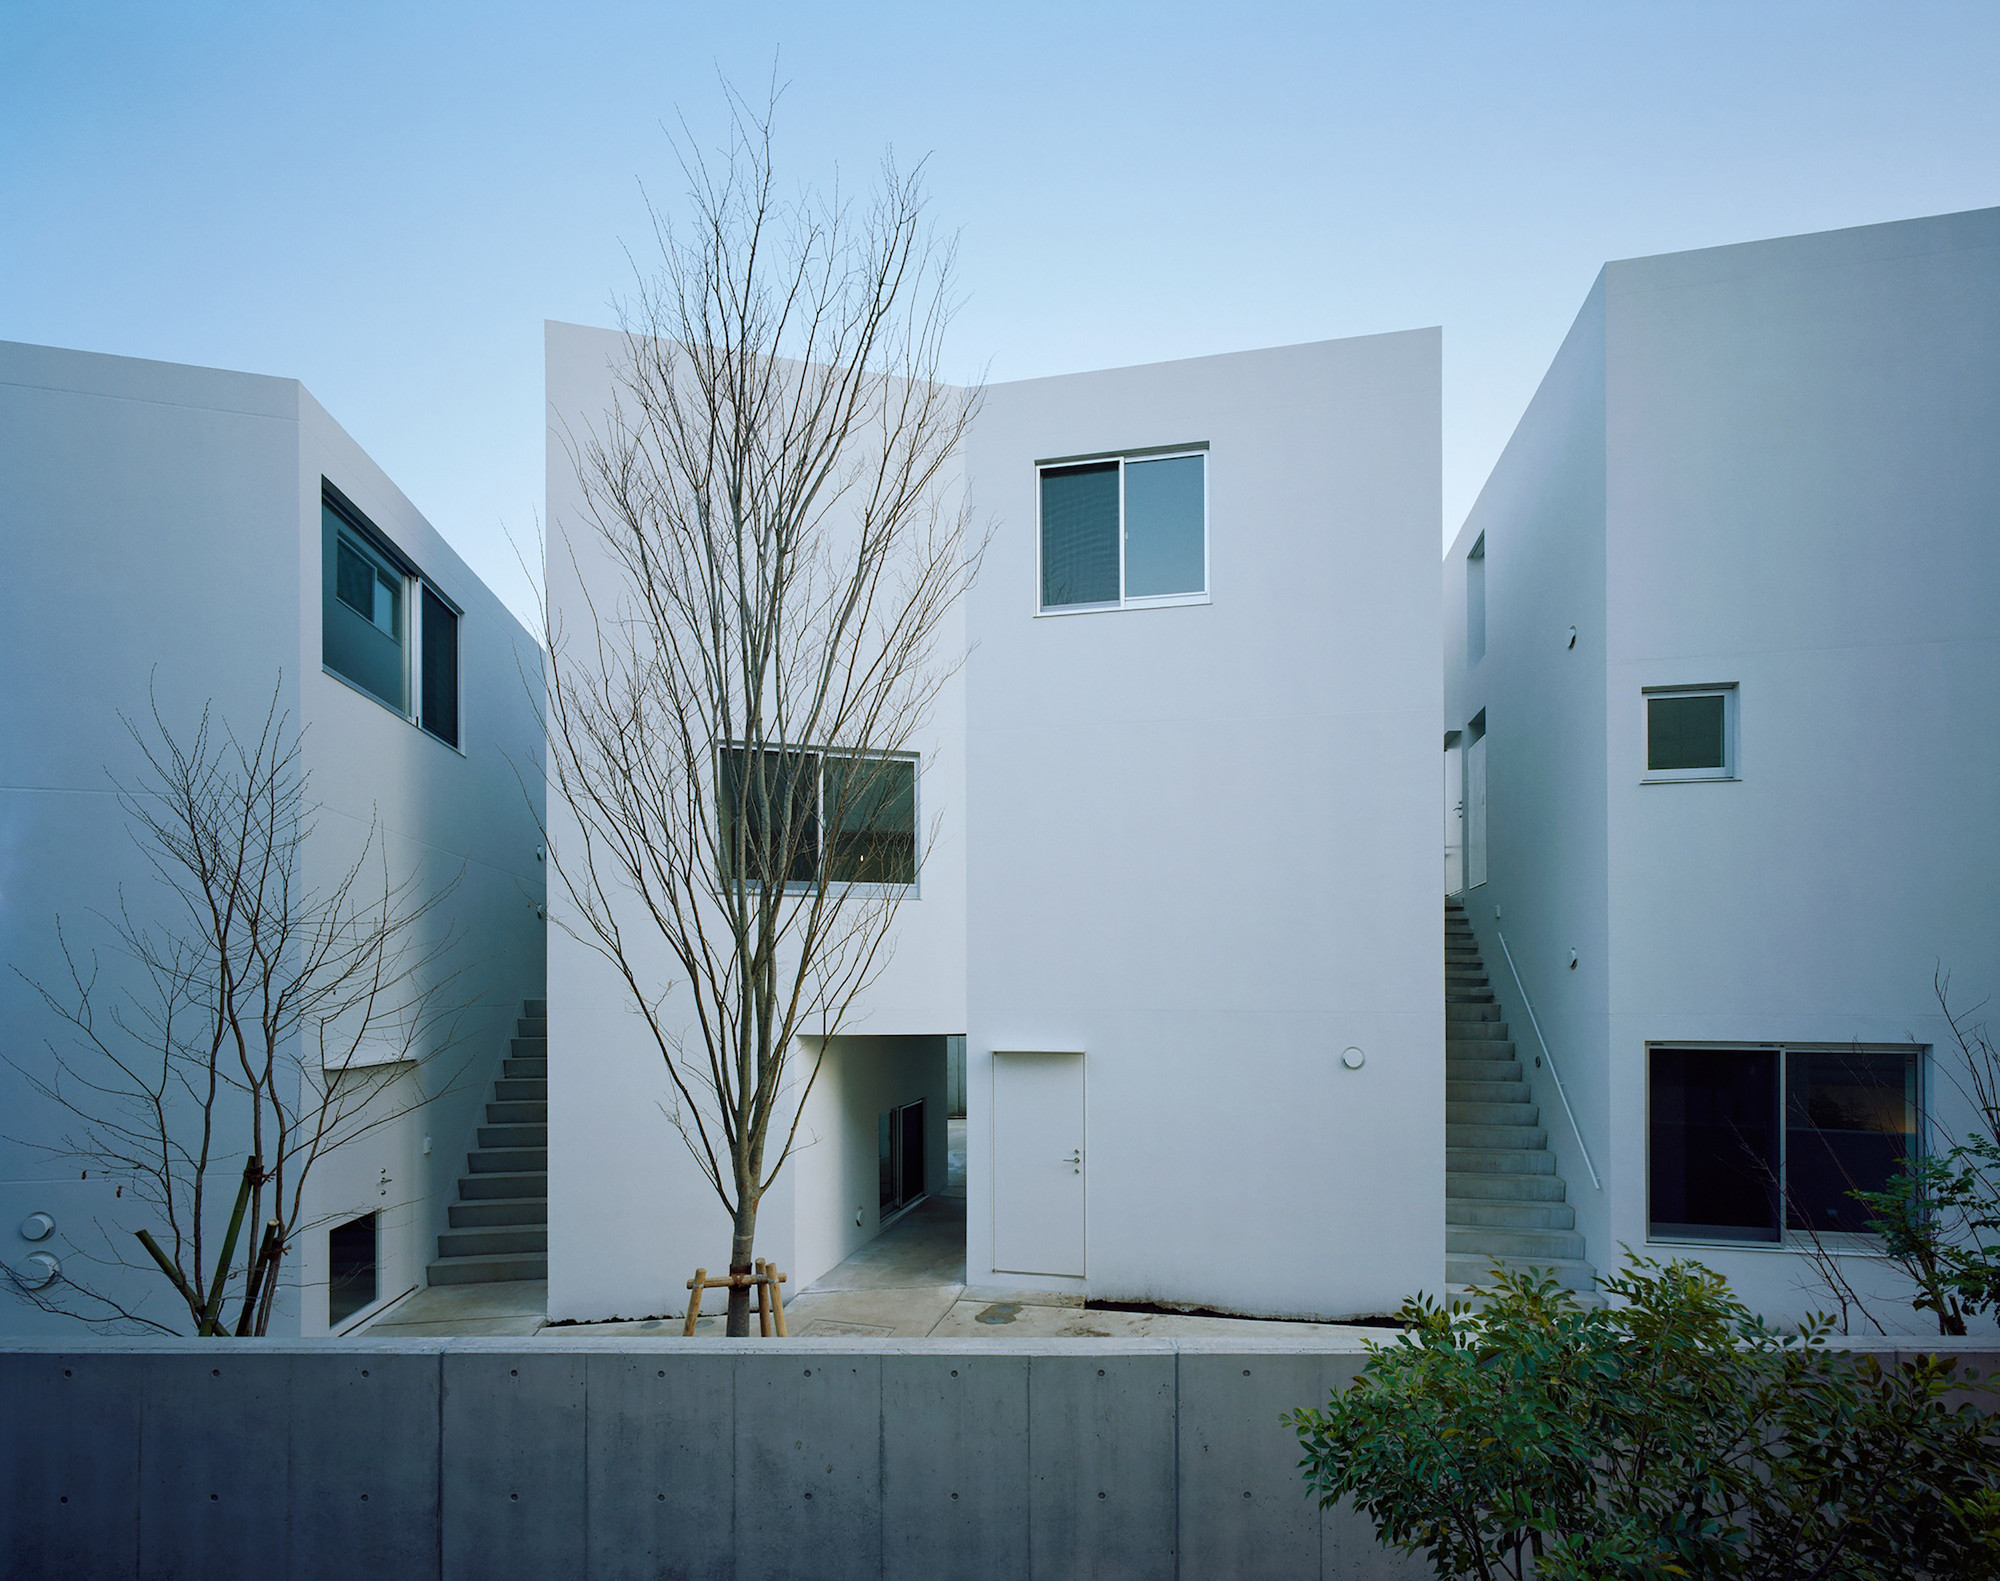 Kaminoge House / Naoya Kawabe Architect & Associates, © Takumi Ota